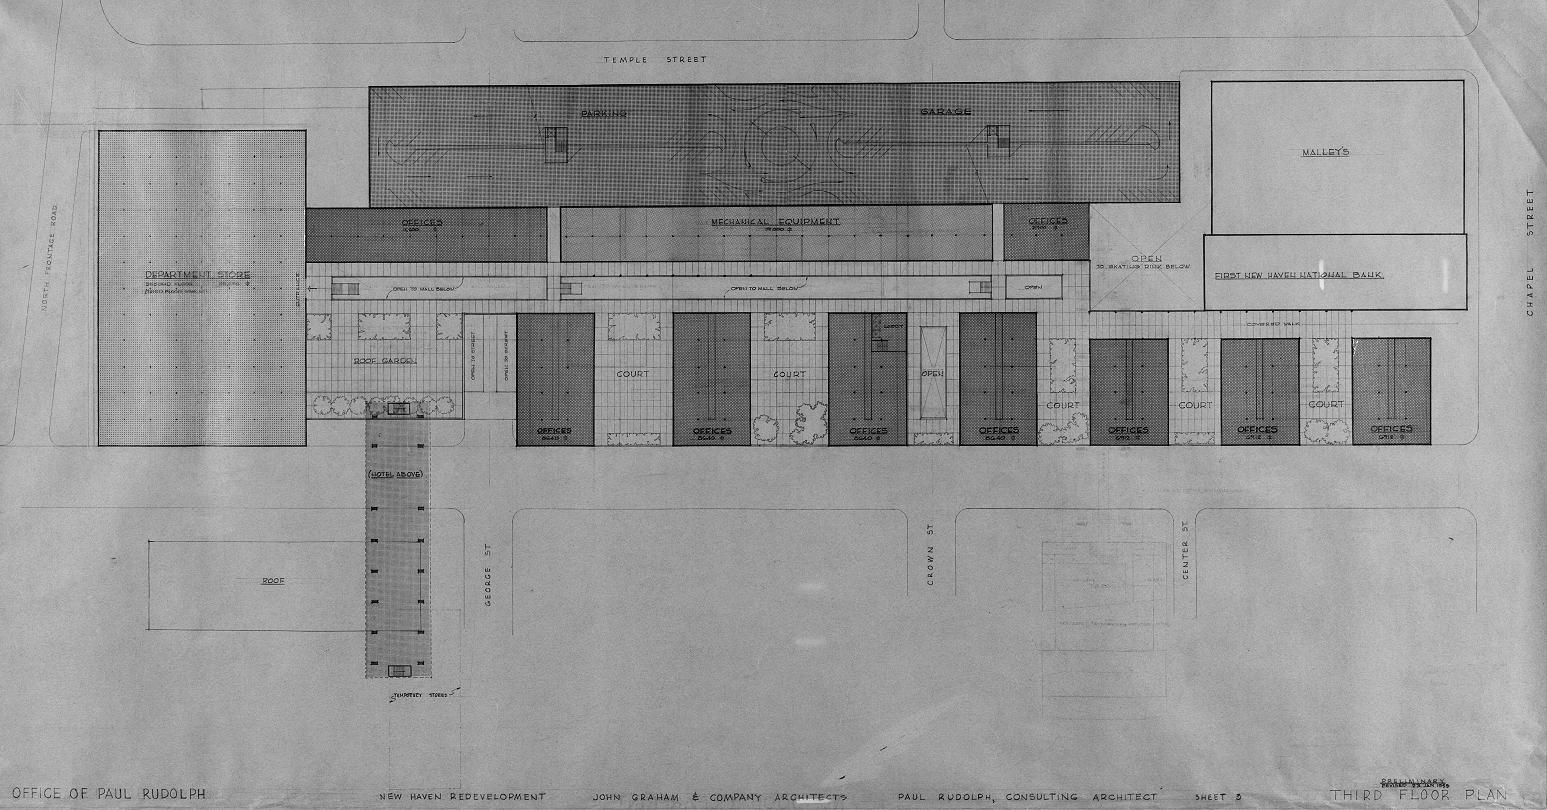 Church Street Redevelopment, New Haven, Connecticut. Third Floor Plan.